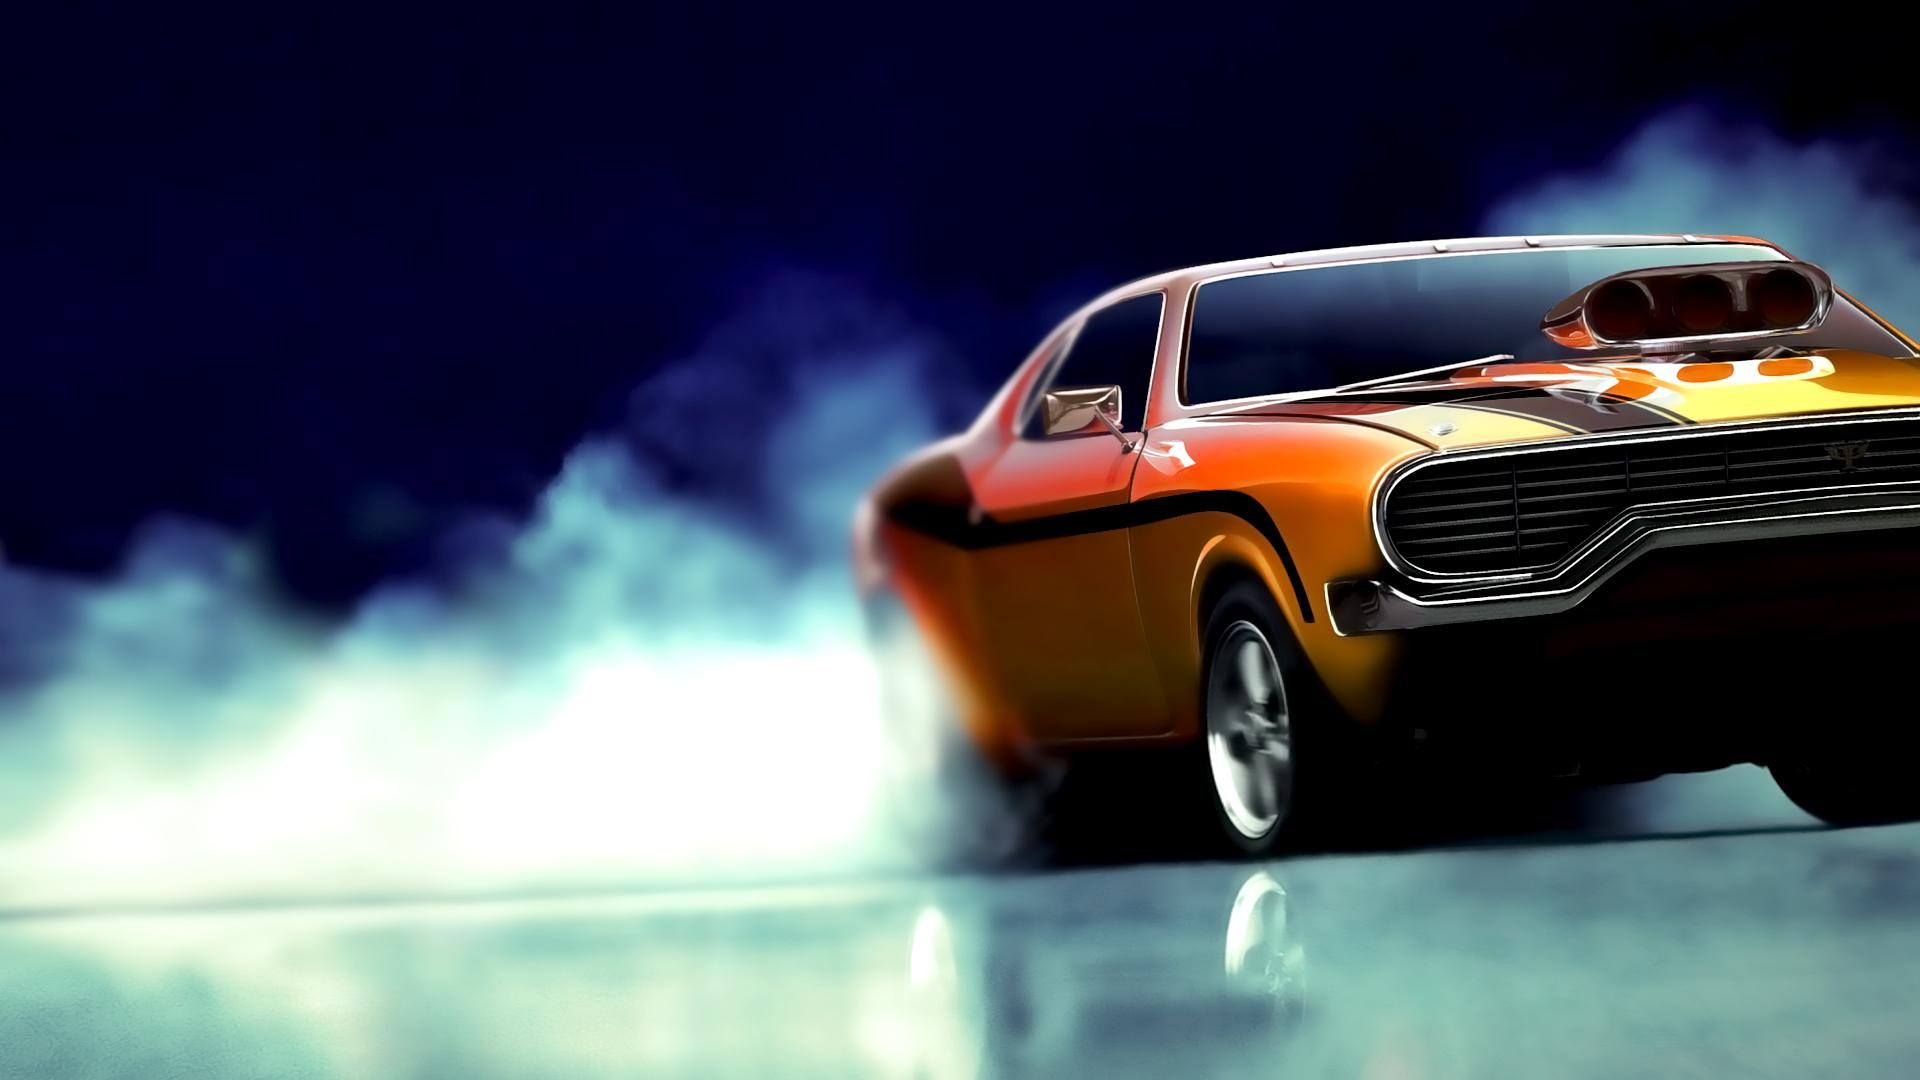 Burnout's Muscle Car By L0053R On DeviantArt